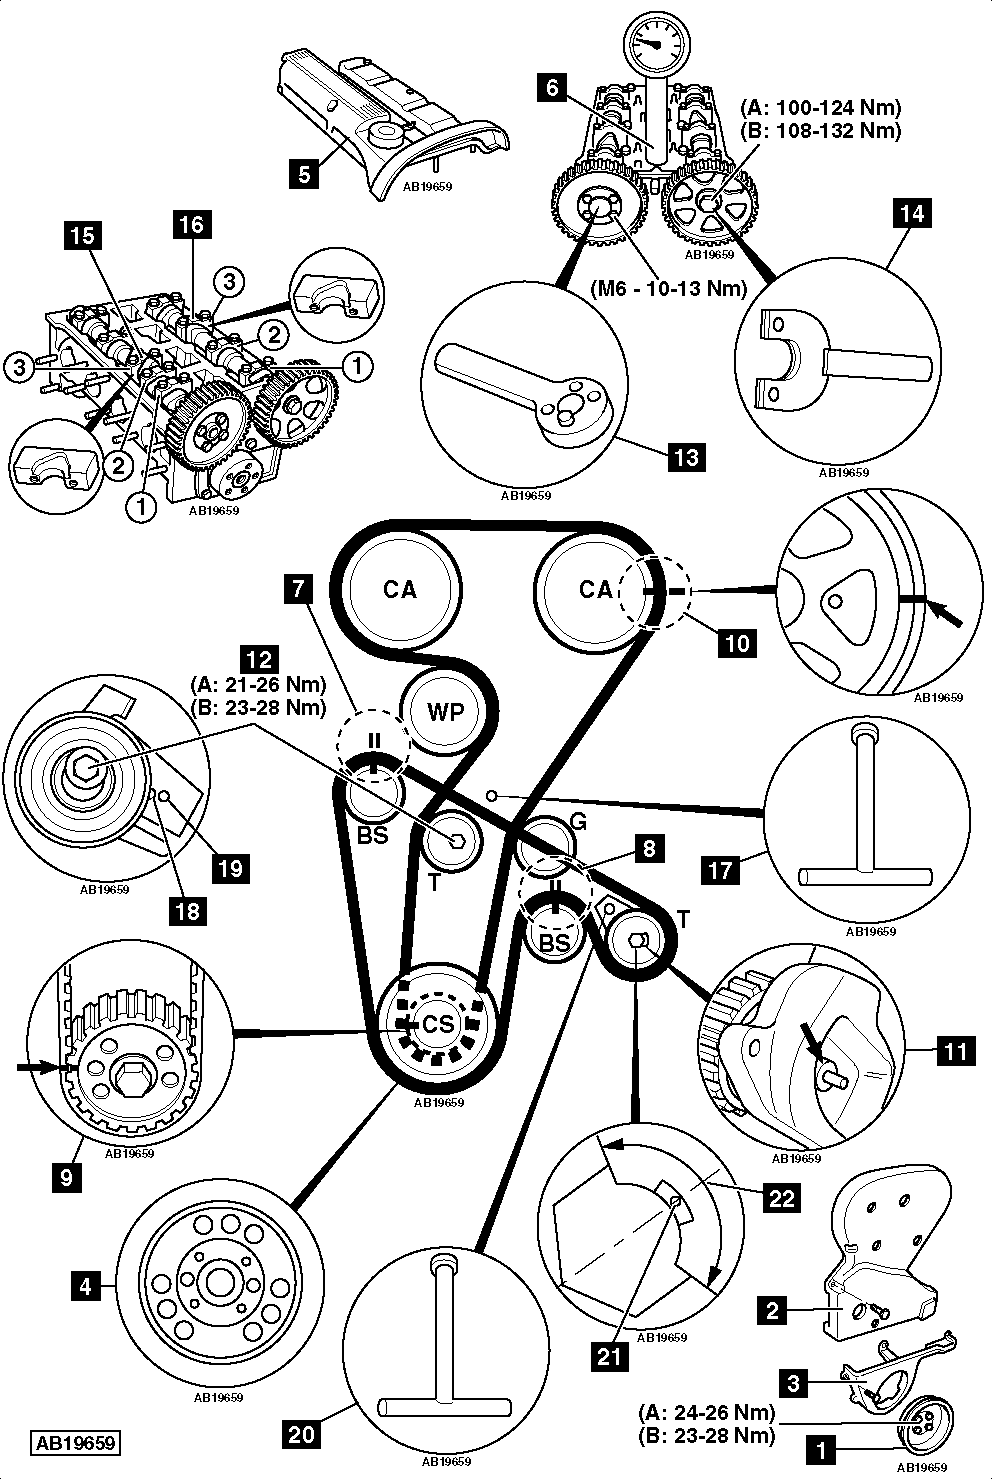 [DVZP_7254]   How to Replace timing belt on Alfa Romeo 156 2.0 TS 16V 2002-2005 - Timing  Belt Replace.com | Alfa Romeo Timing Belt |  | Timing Belt Replace.com